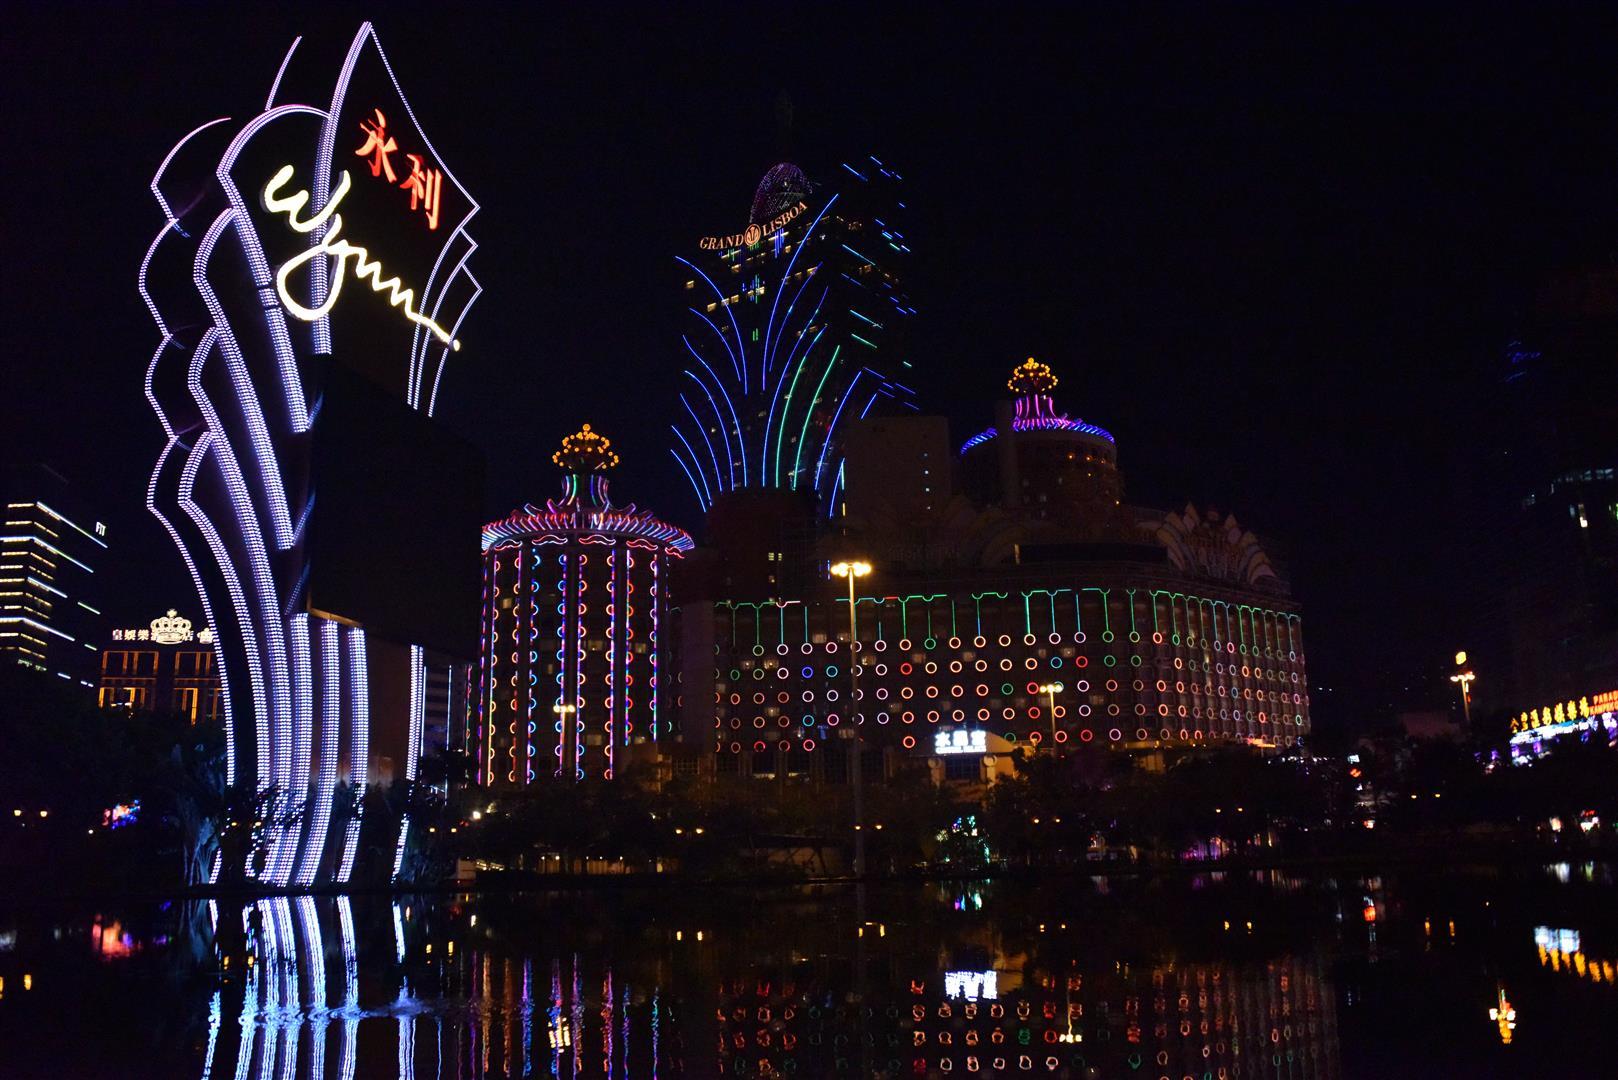 Macau Casino 04 (Large)